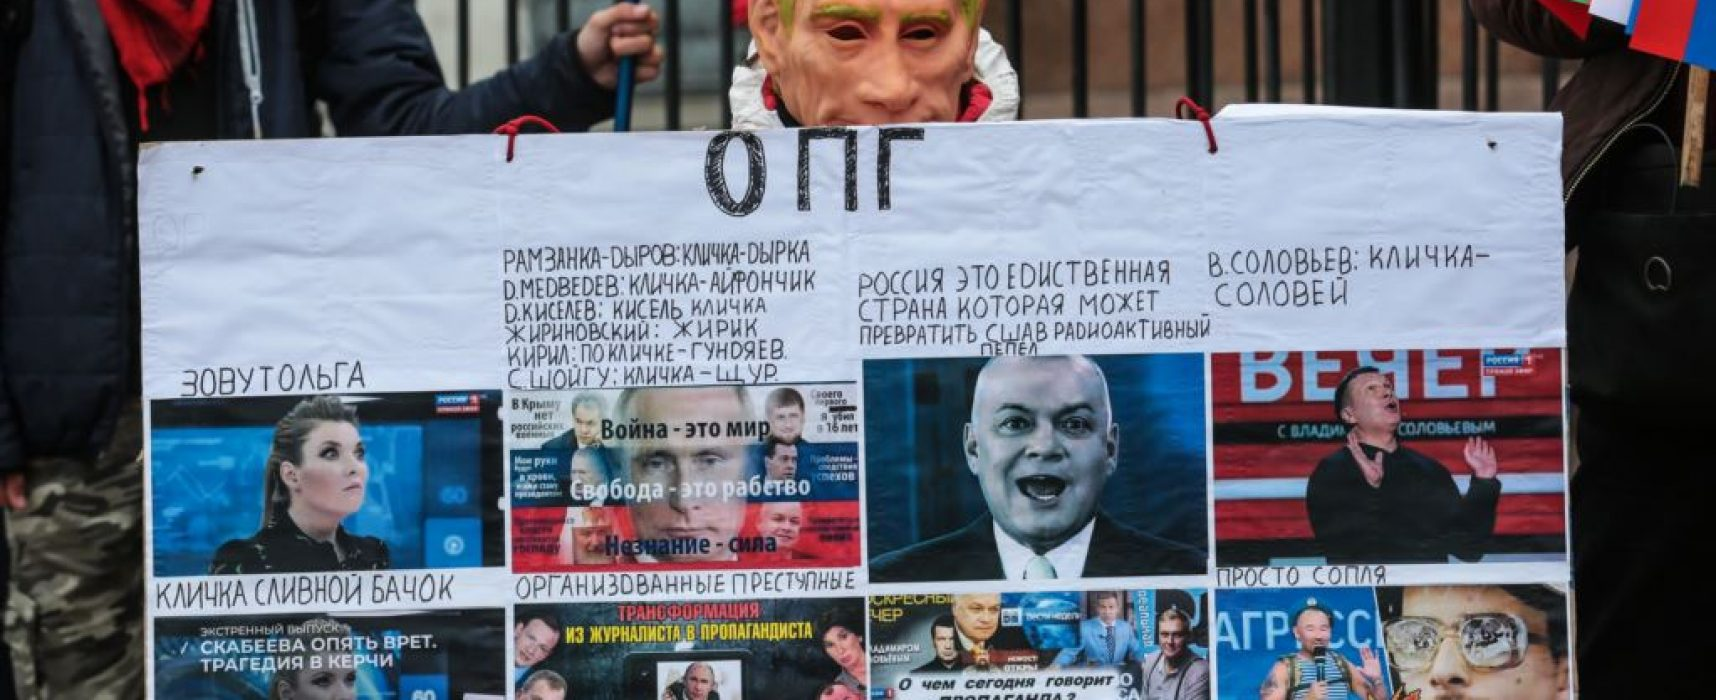 Russian TV host claims Ukraine bashing not on purpose